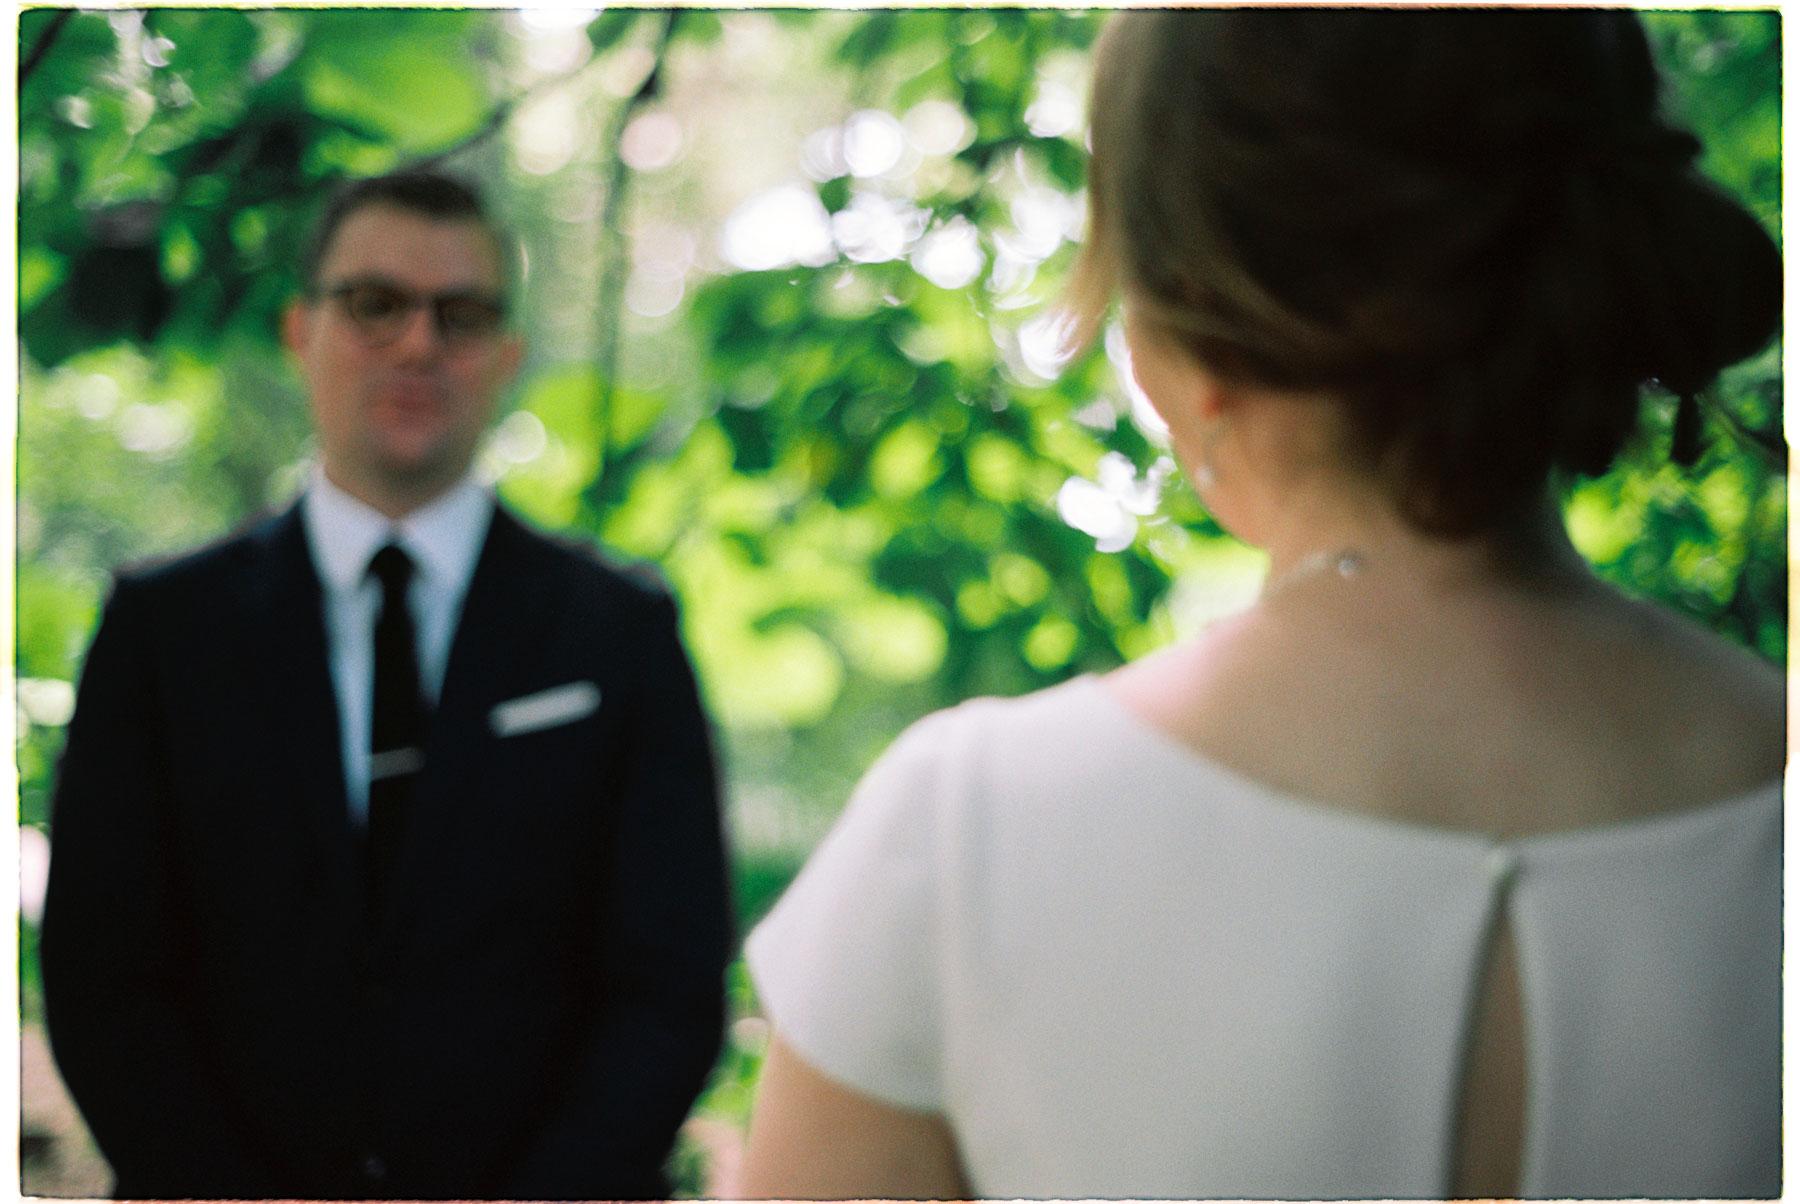 bryllupsfotografering fra botanisk hage, brud ser på brudgom